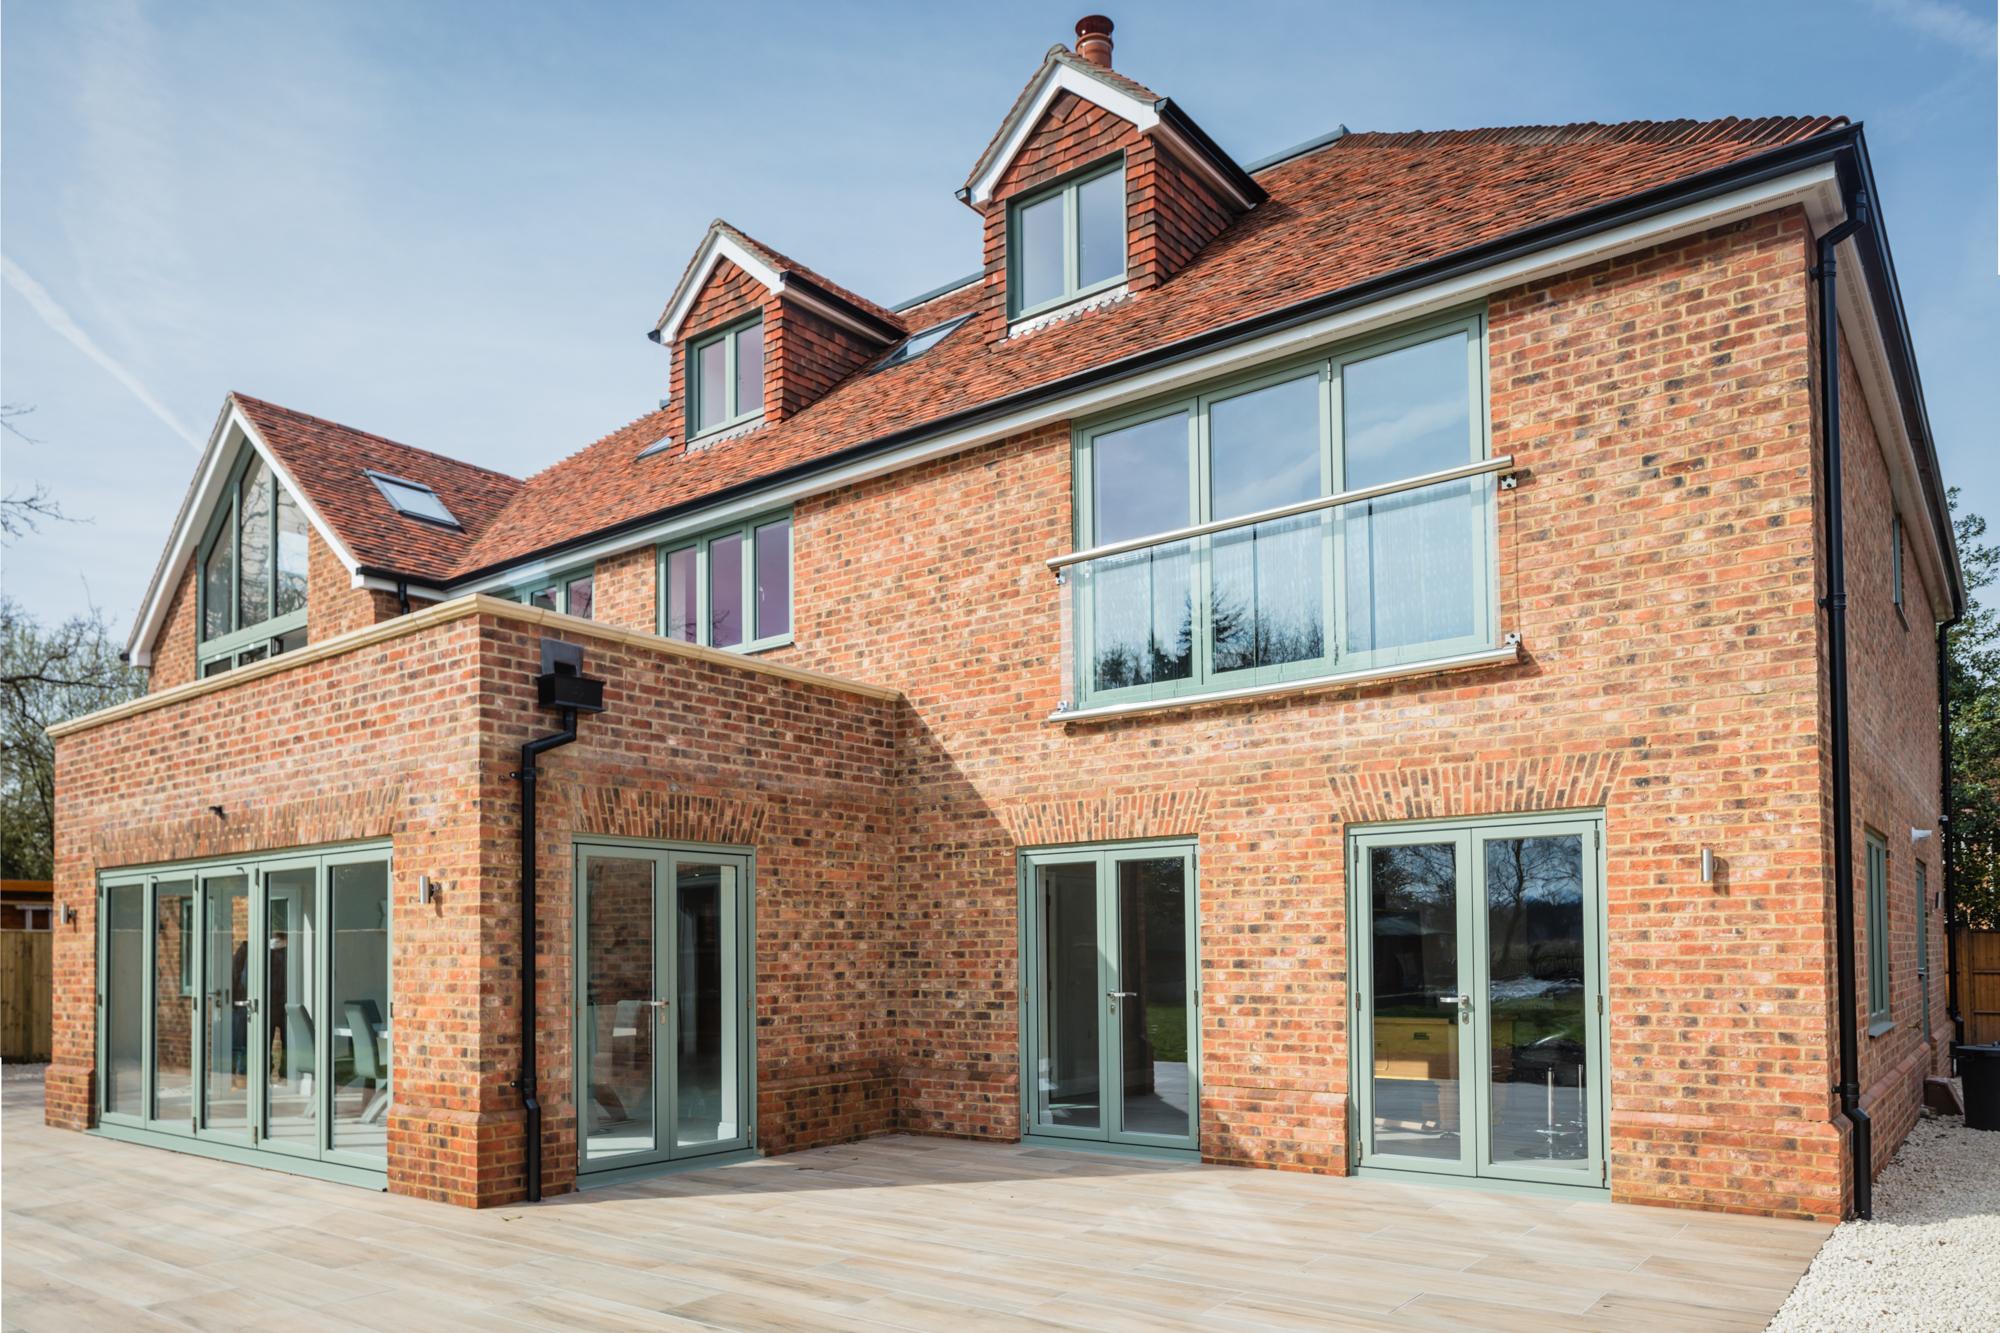 Bespoke home bricks, brick arches